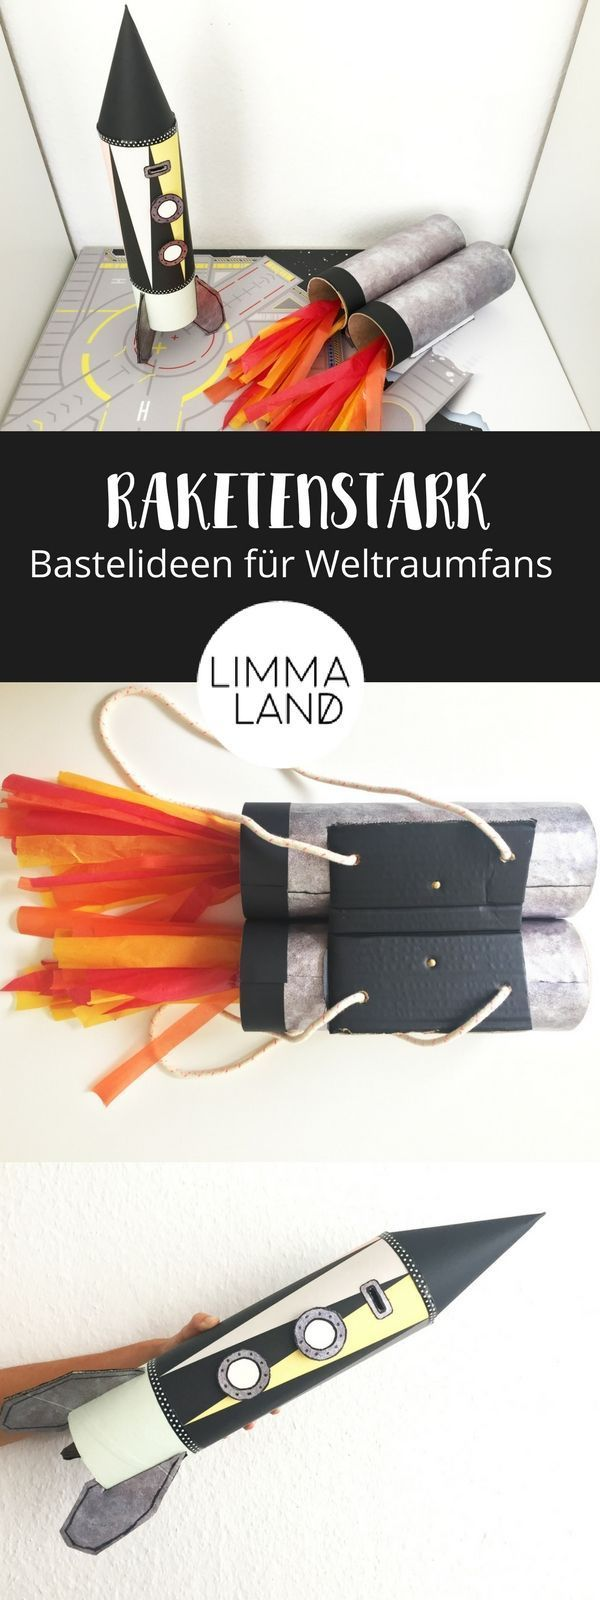 Rakete basteln - Tolle Upcycling Ideen für kleine Astronauten – Limmaland Blog  #Astronauten #basteln #Blog #für #Ideen #Kleine #Limmaland #Rakete #tolle #upcycling